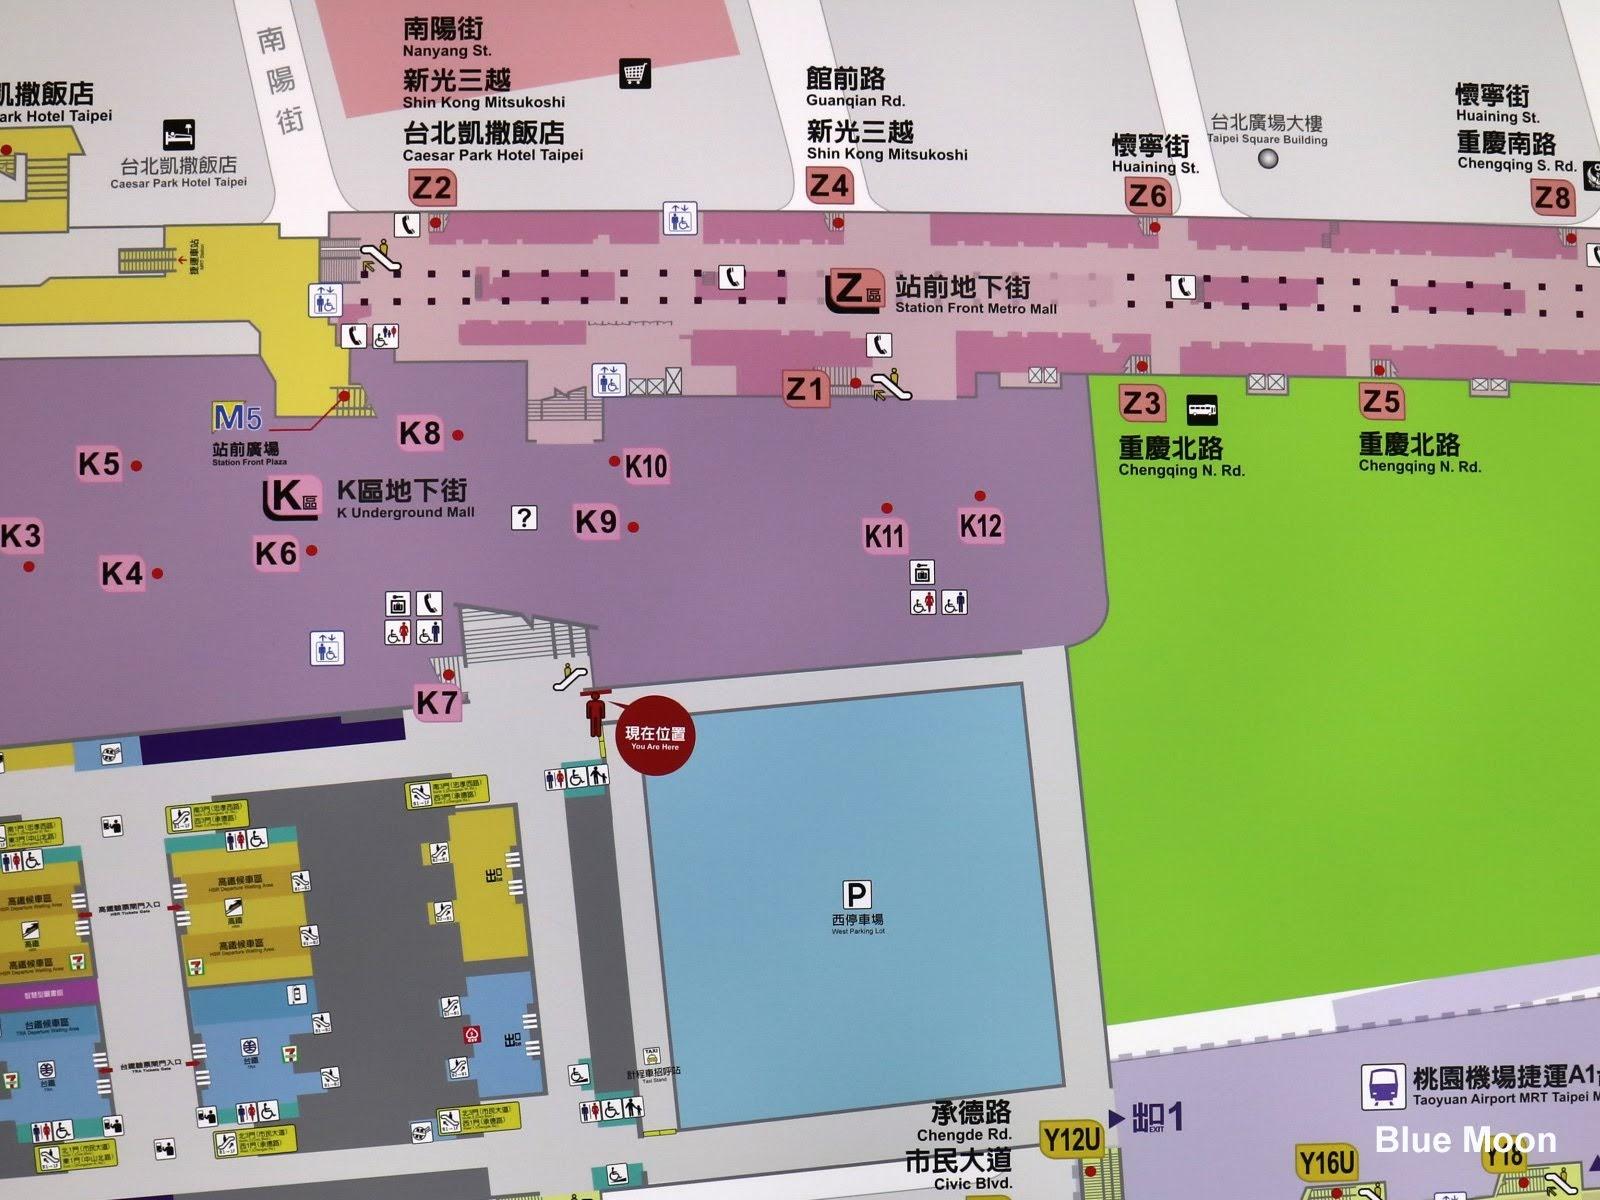 Hotel Near Taipei Main Train Station